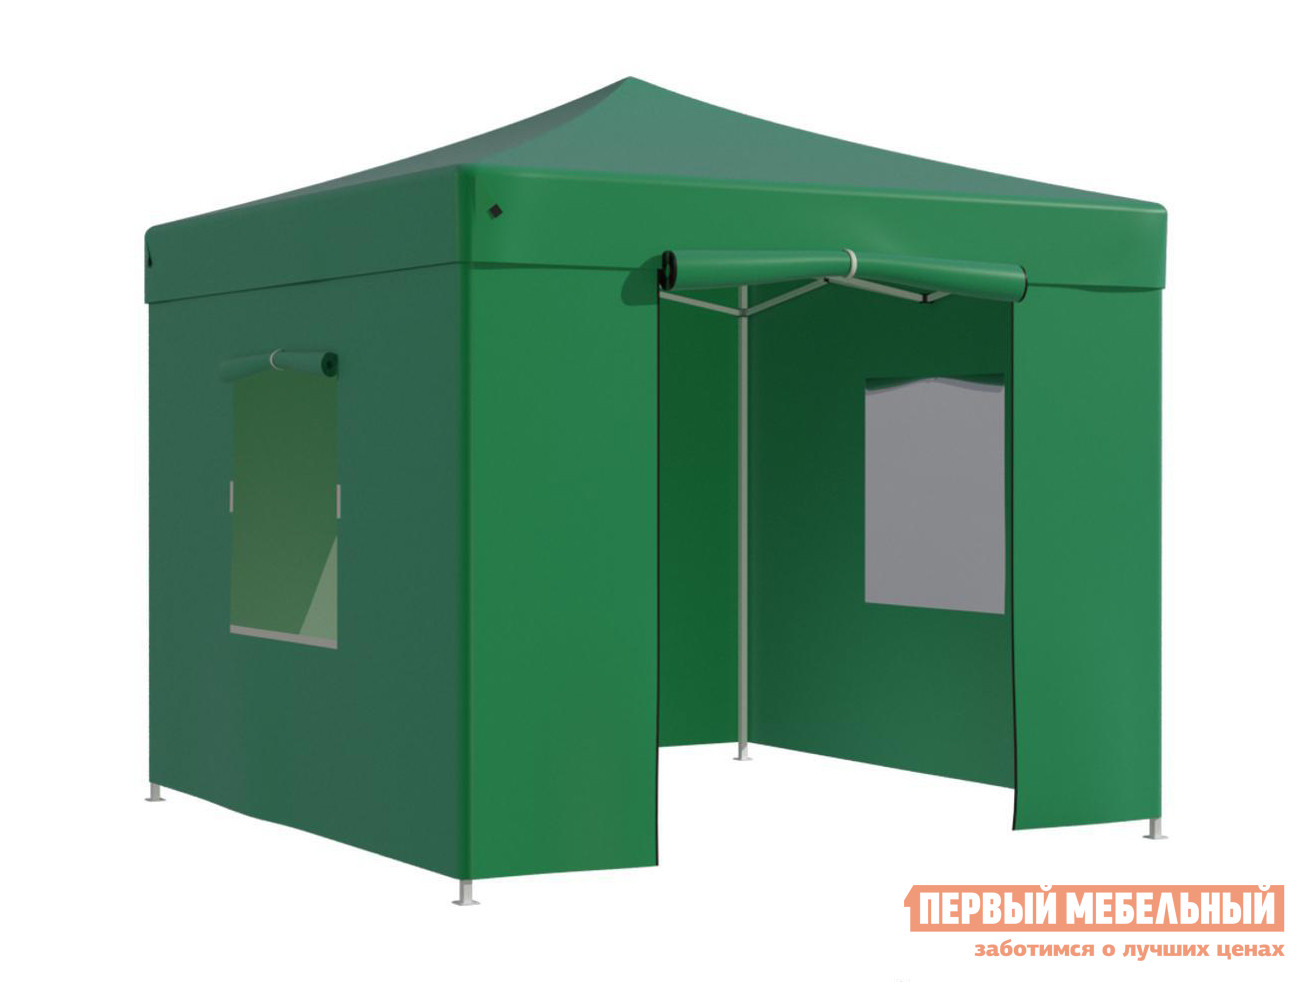 Шатер для дачи  4330/4331/4332 Зеленый